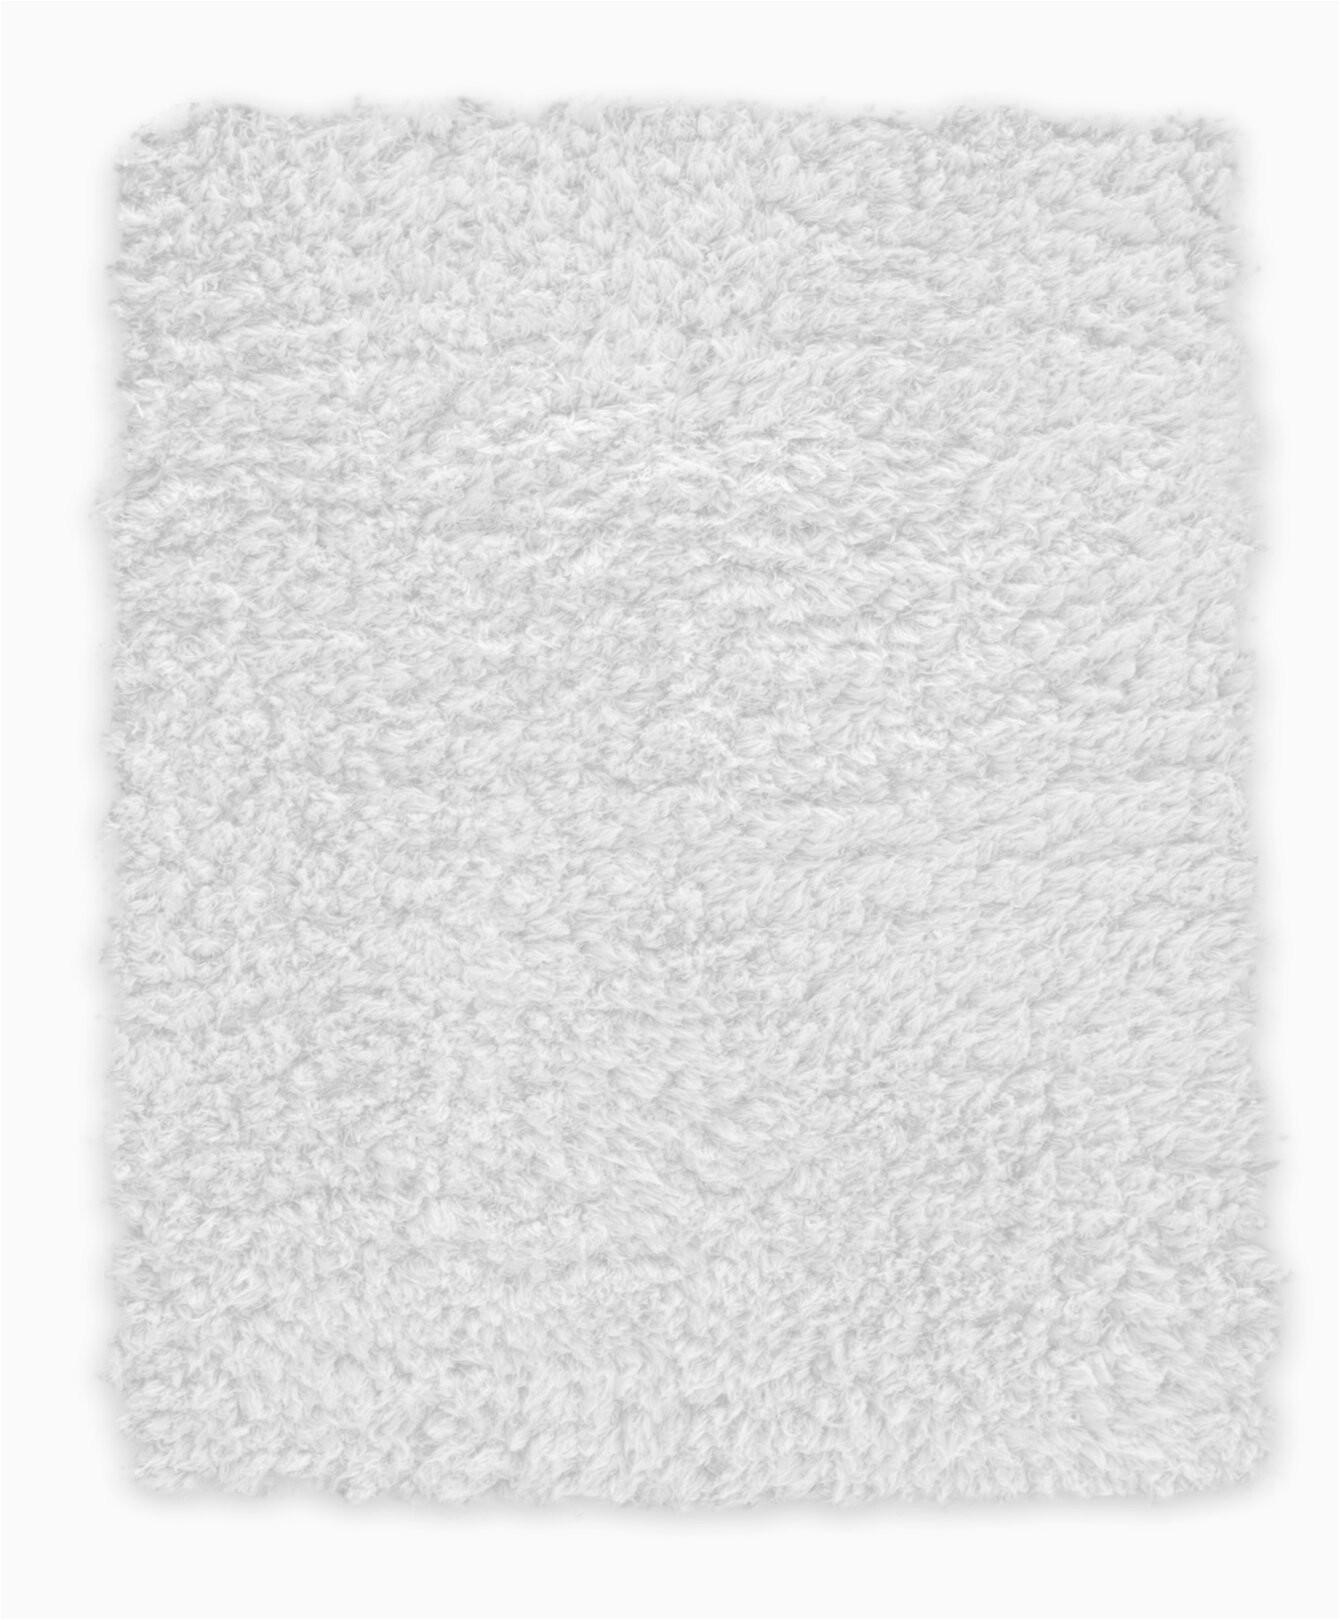 Cloud Step Memory Foam Bath Rug Earlscourt Waterproof Memory Foam Bath Rug